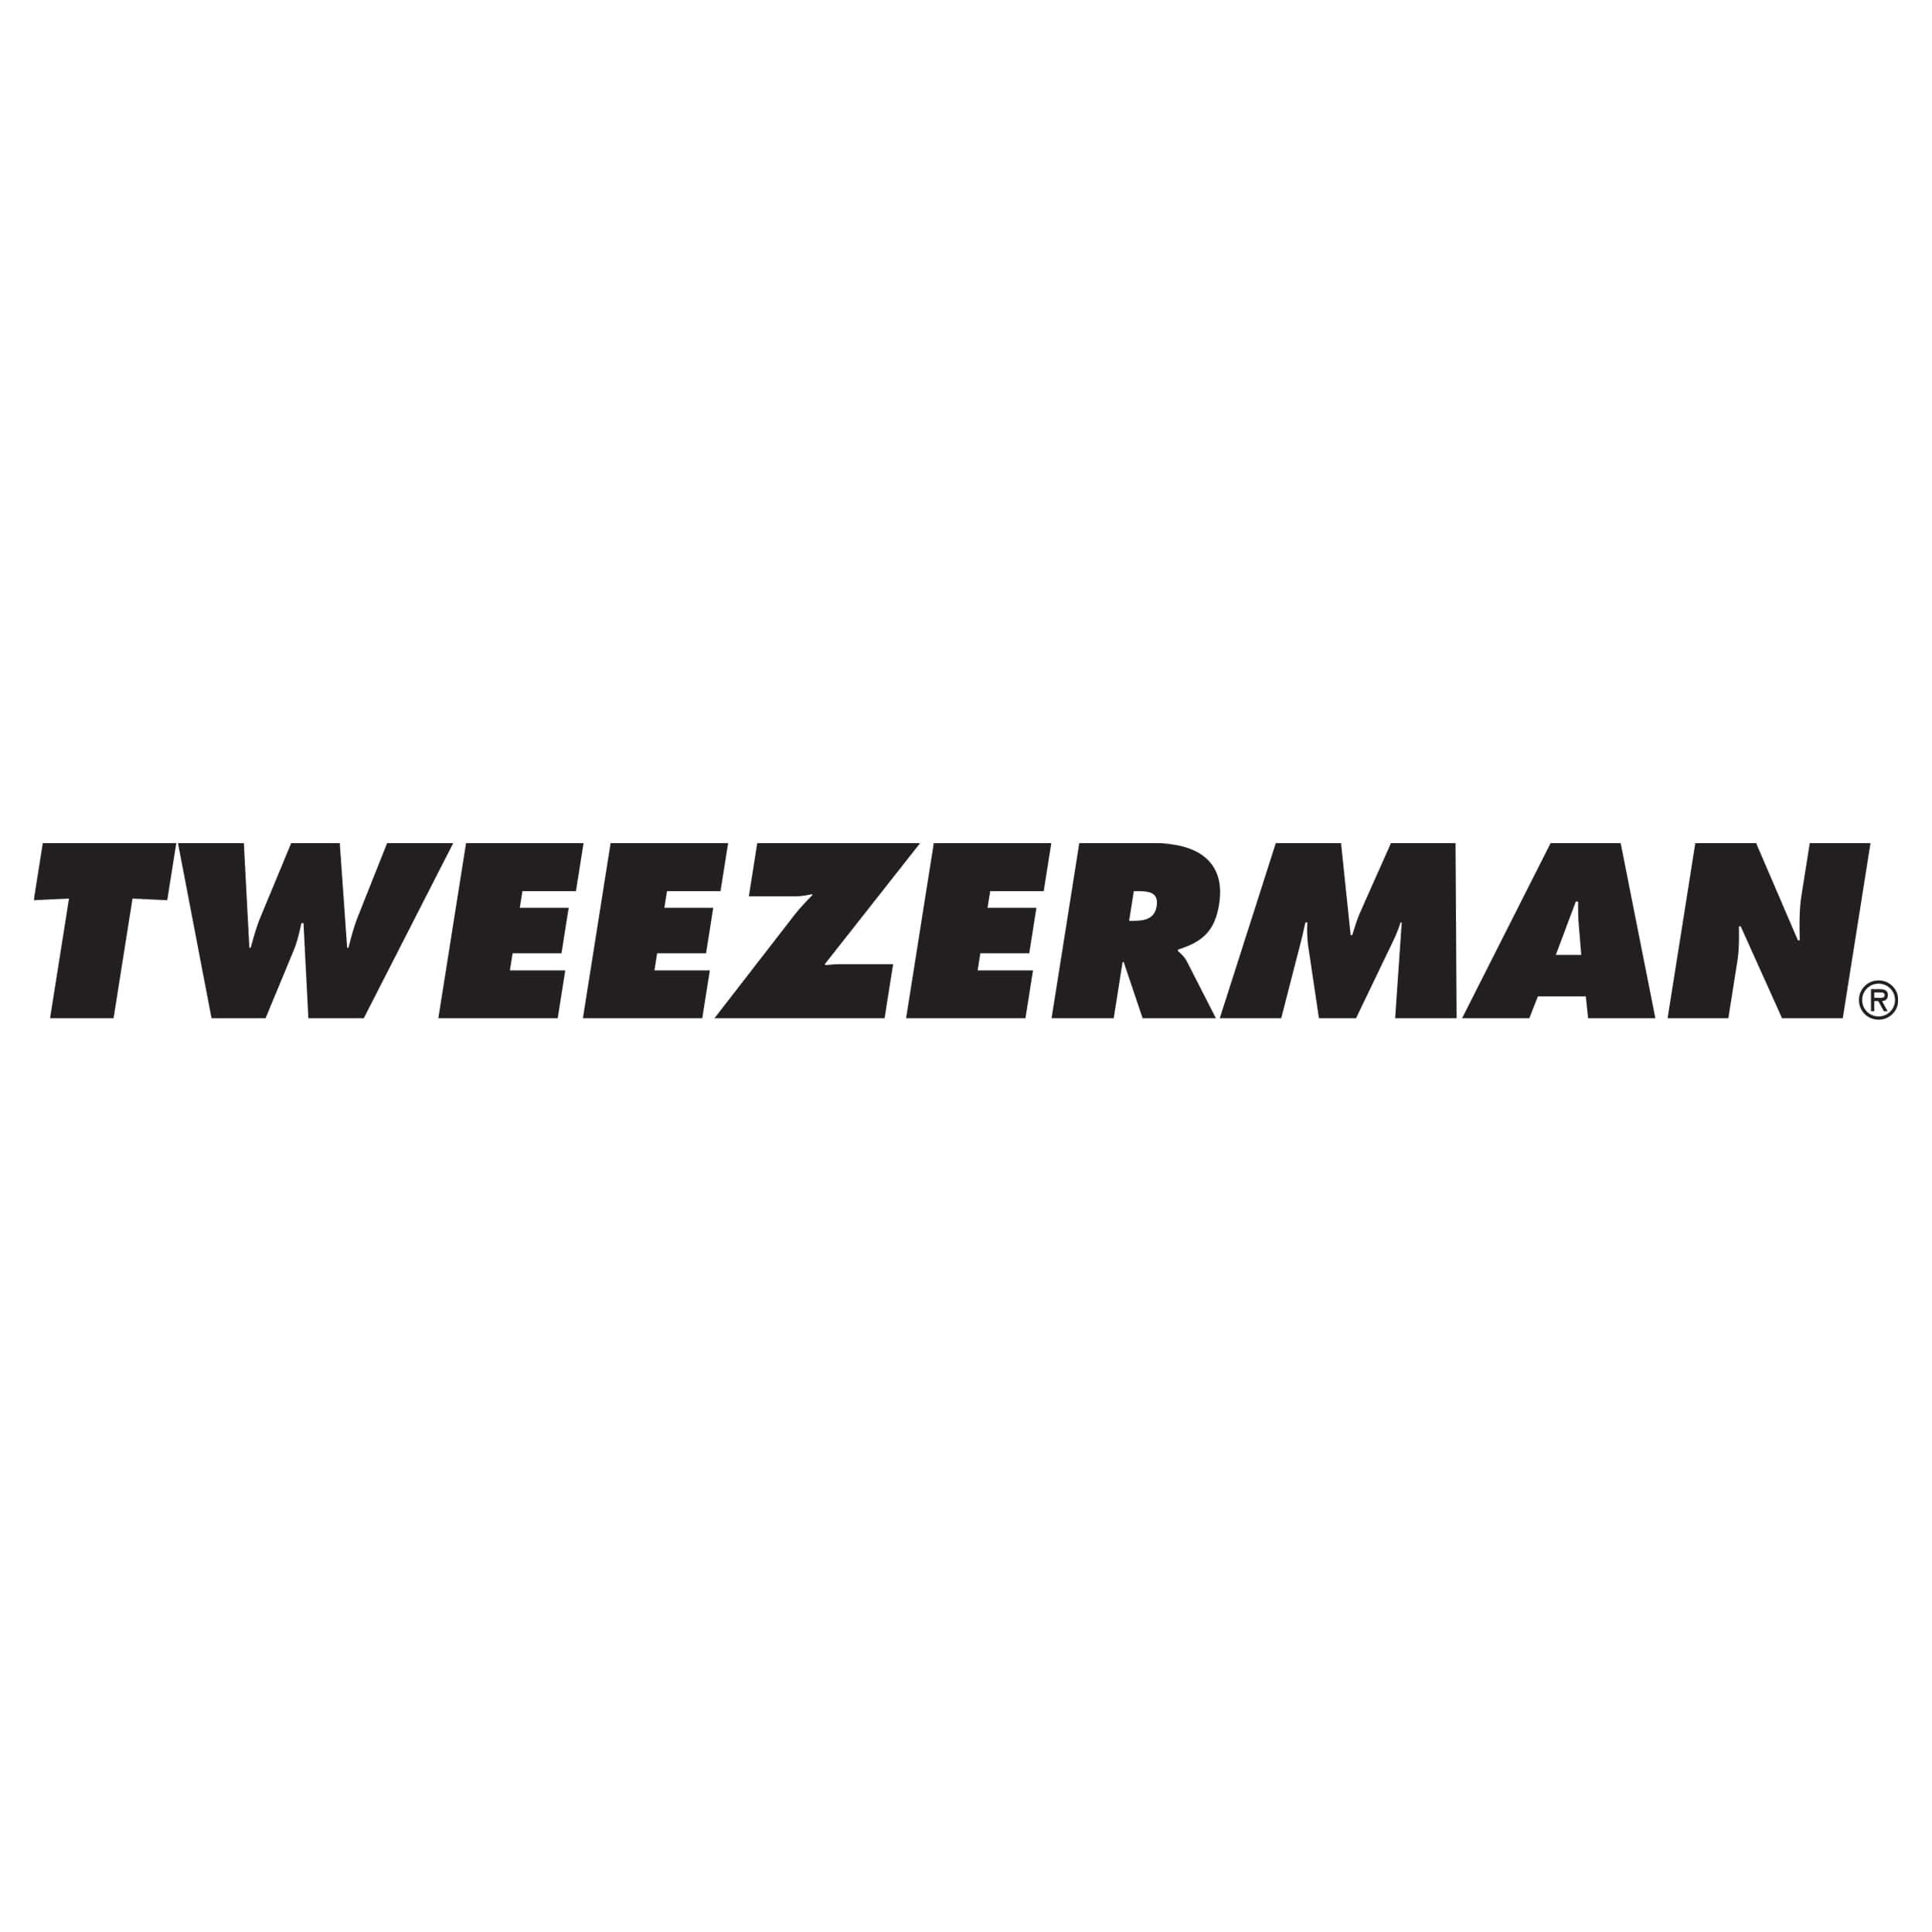 Stainless Steel Maximum Precision Toenail Clippers | Tweezerman